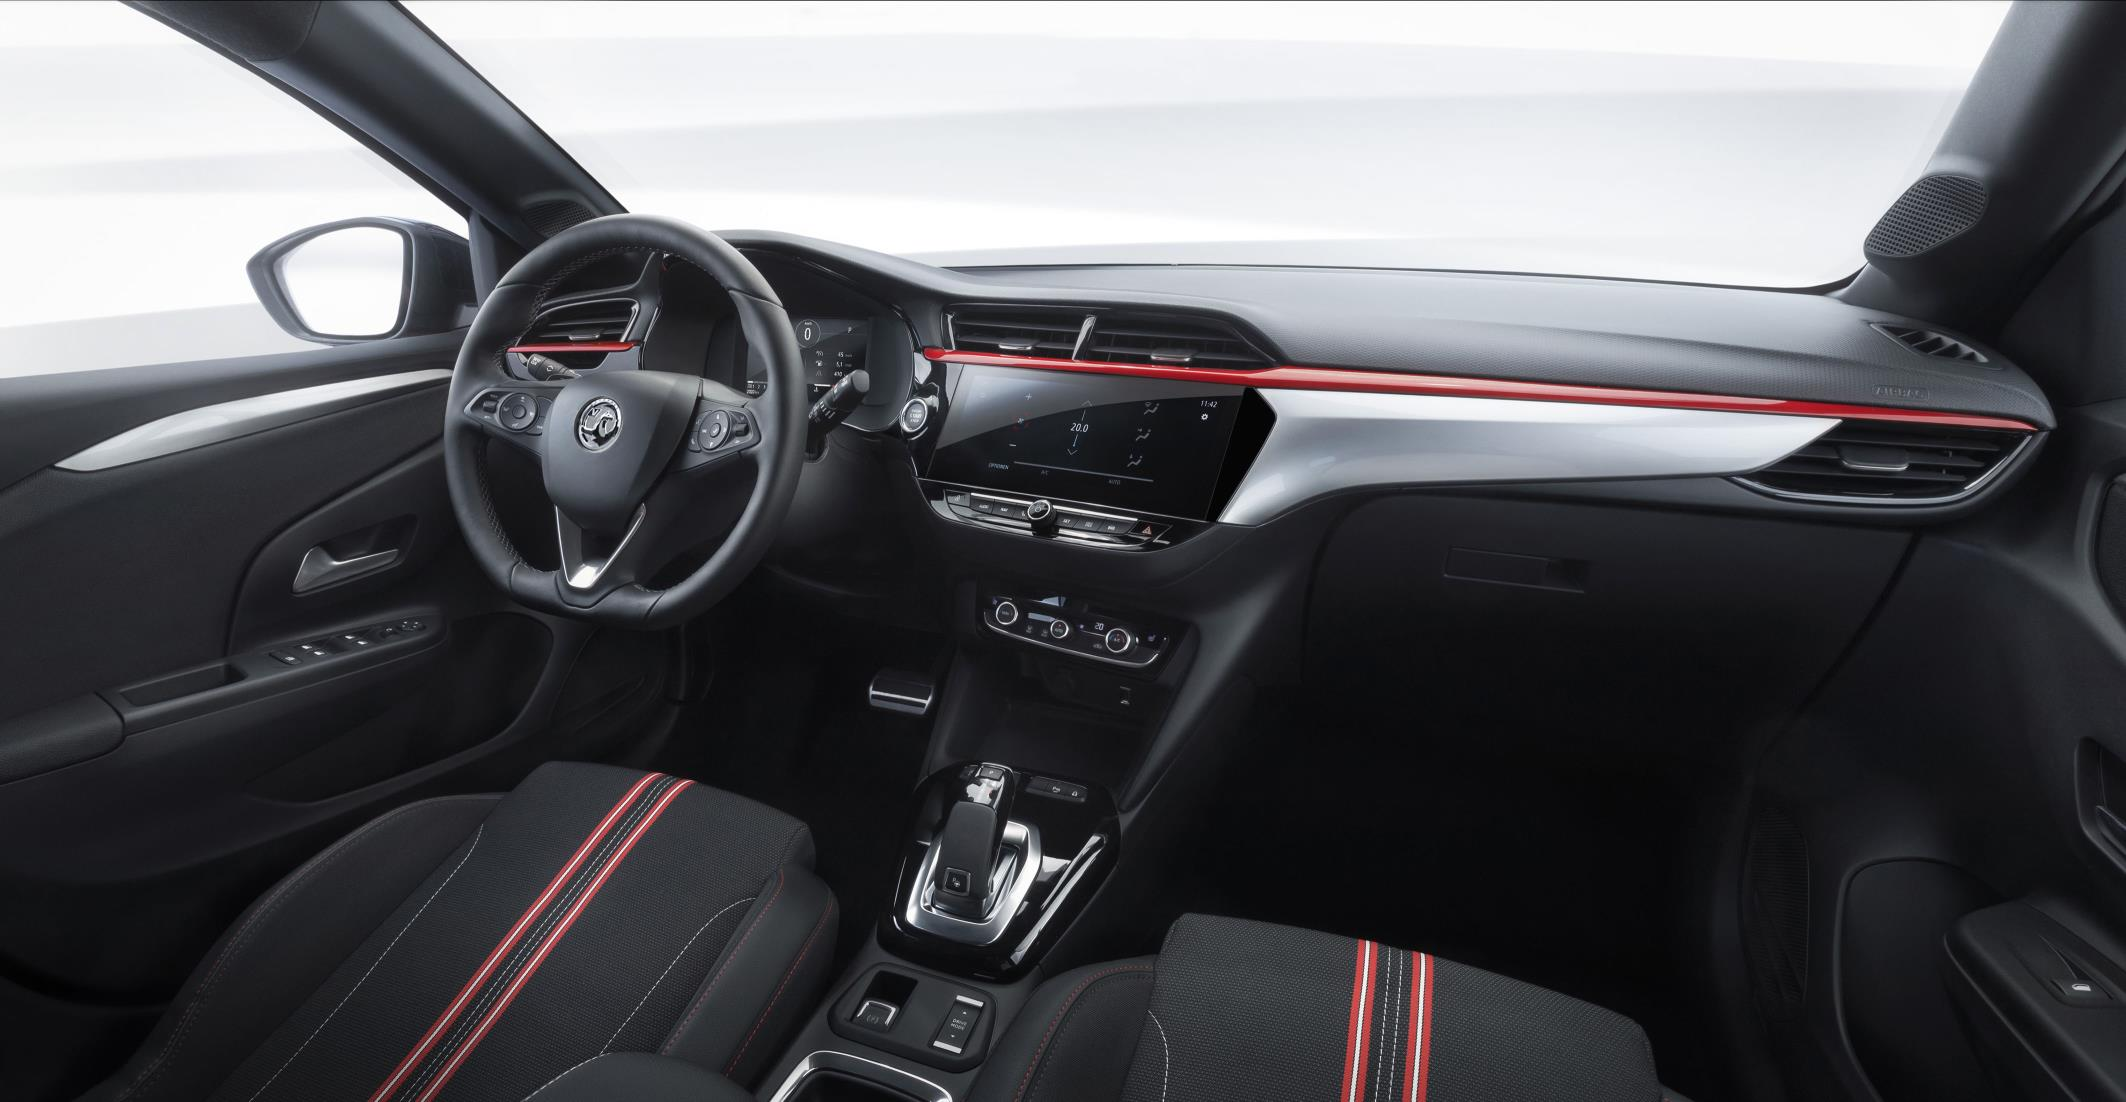 2019 Vauxhall Corsa interior-1.jpg (174 KB)